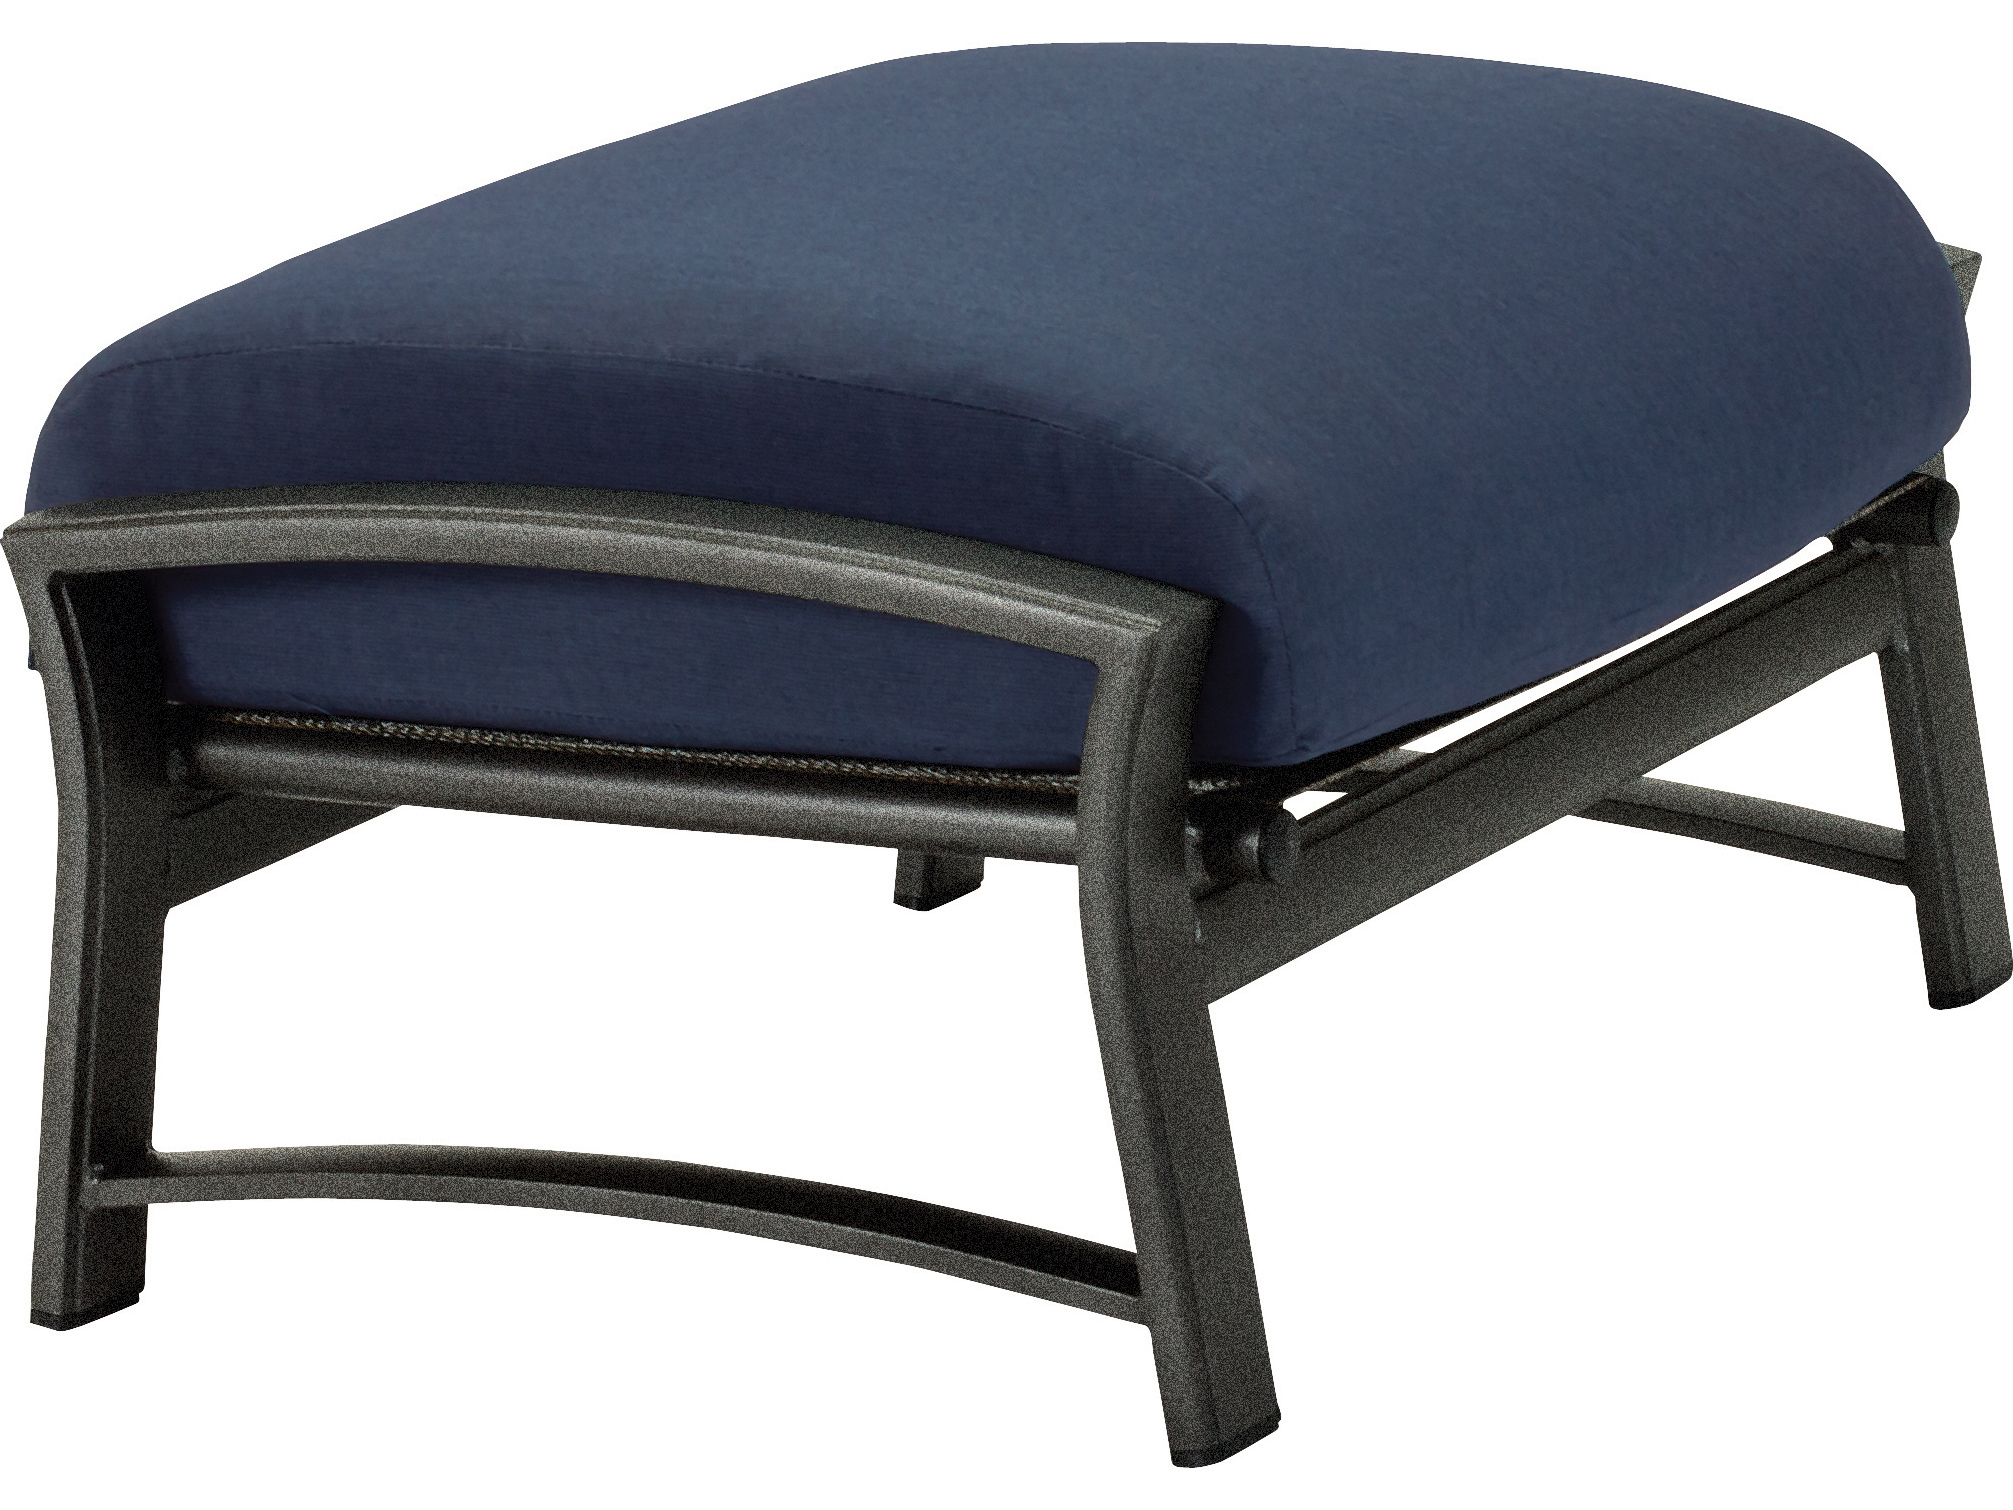 Tropitone Corsica Replacement Cushion For Ottoman 171317ch